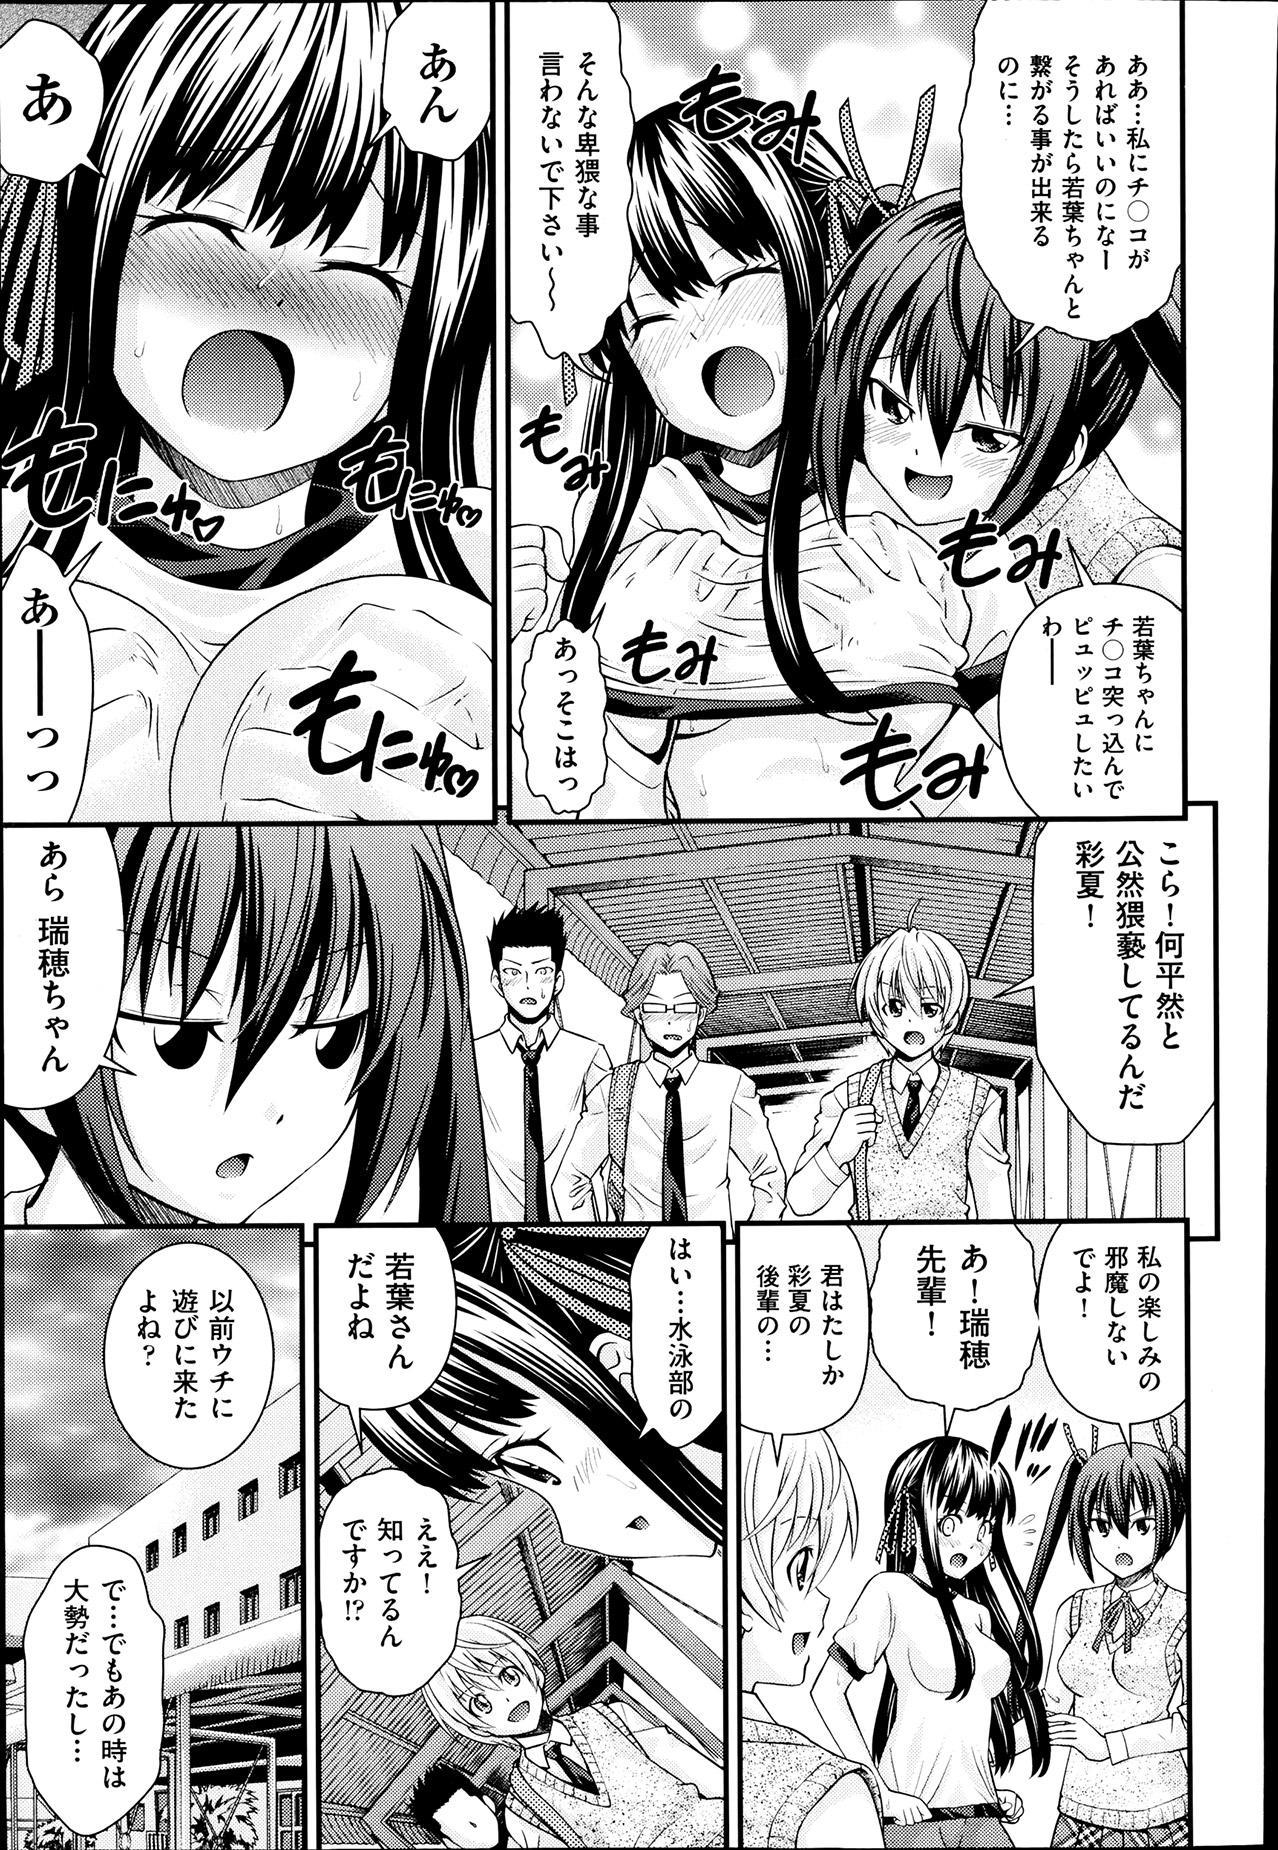 Kyoudai Replace 6